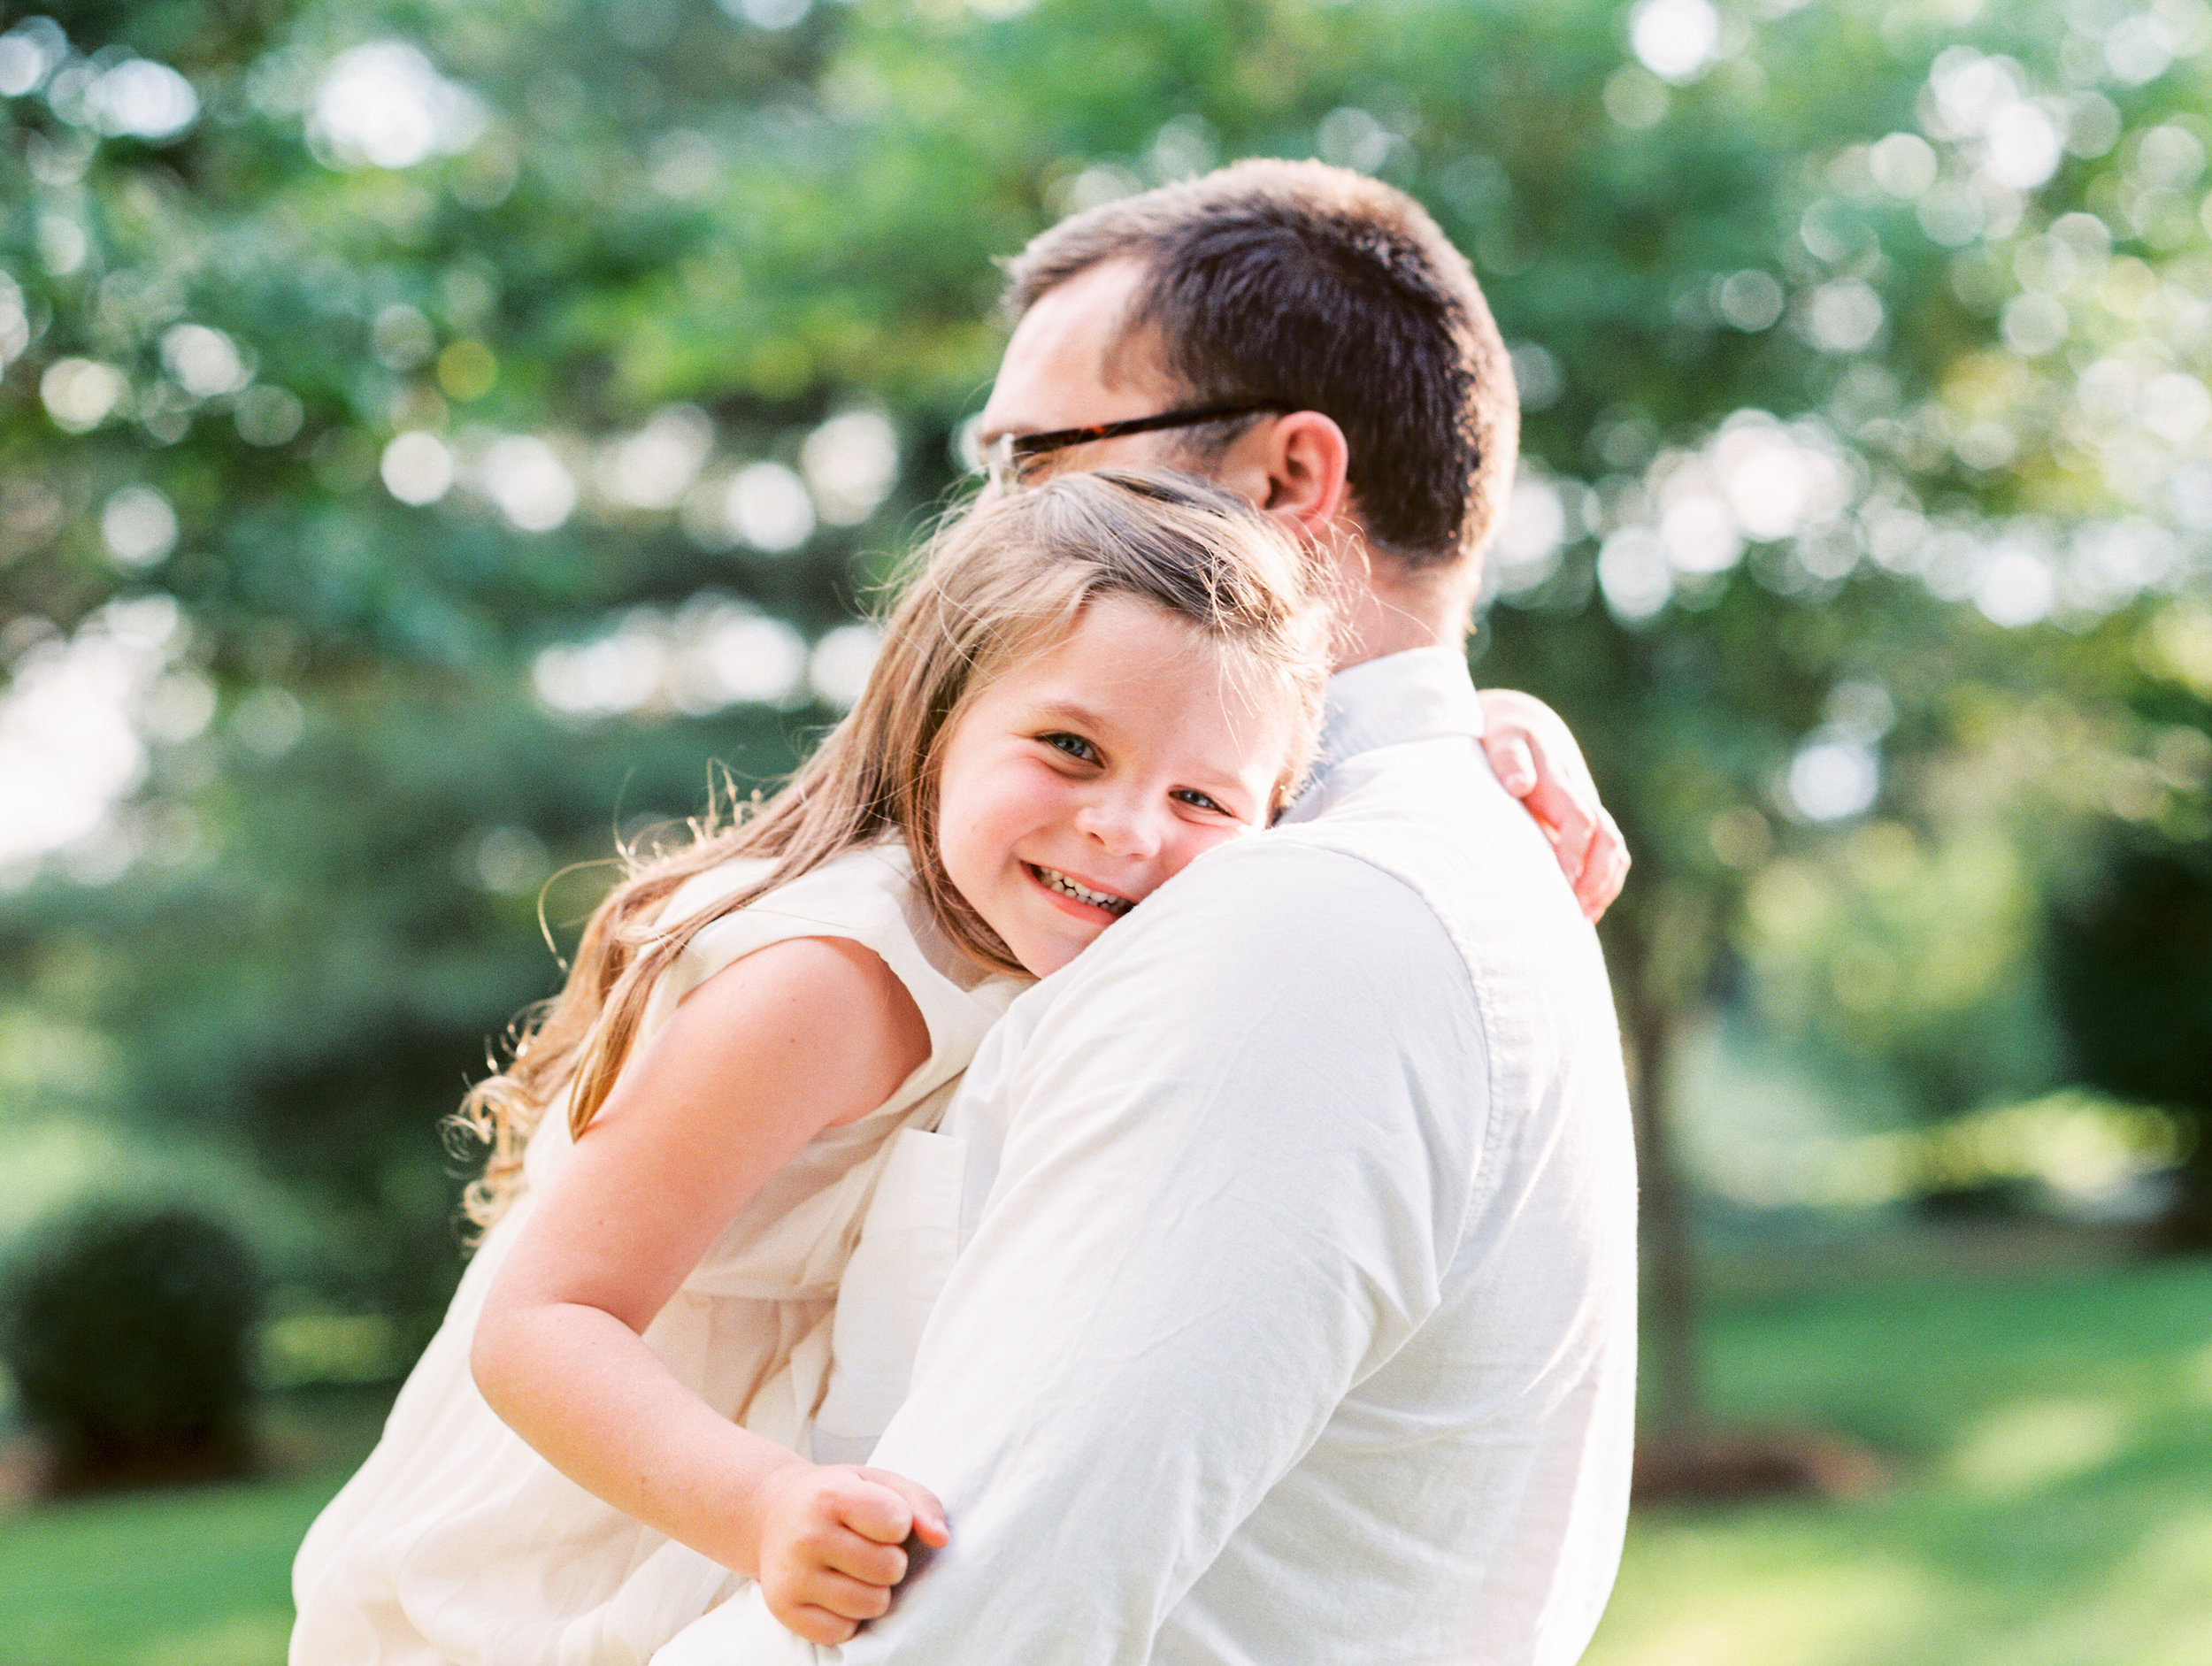 Lynchburg Virginia Wedding and Family Photographer || Ashley Eiban Photography || Central Virginia Photographer || www.ashleyeiban.com